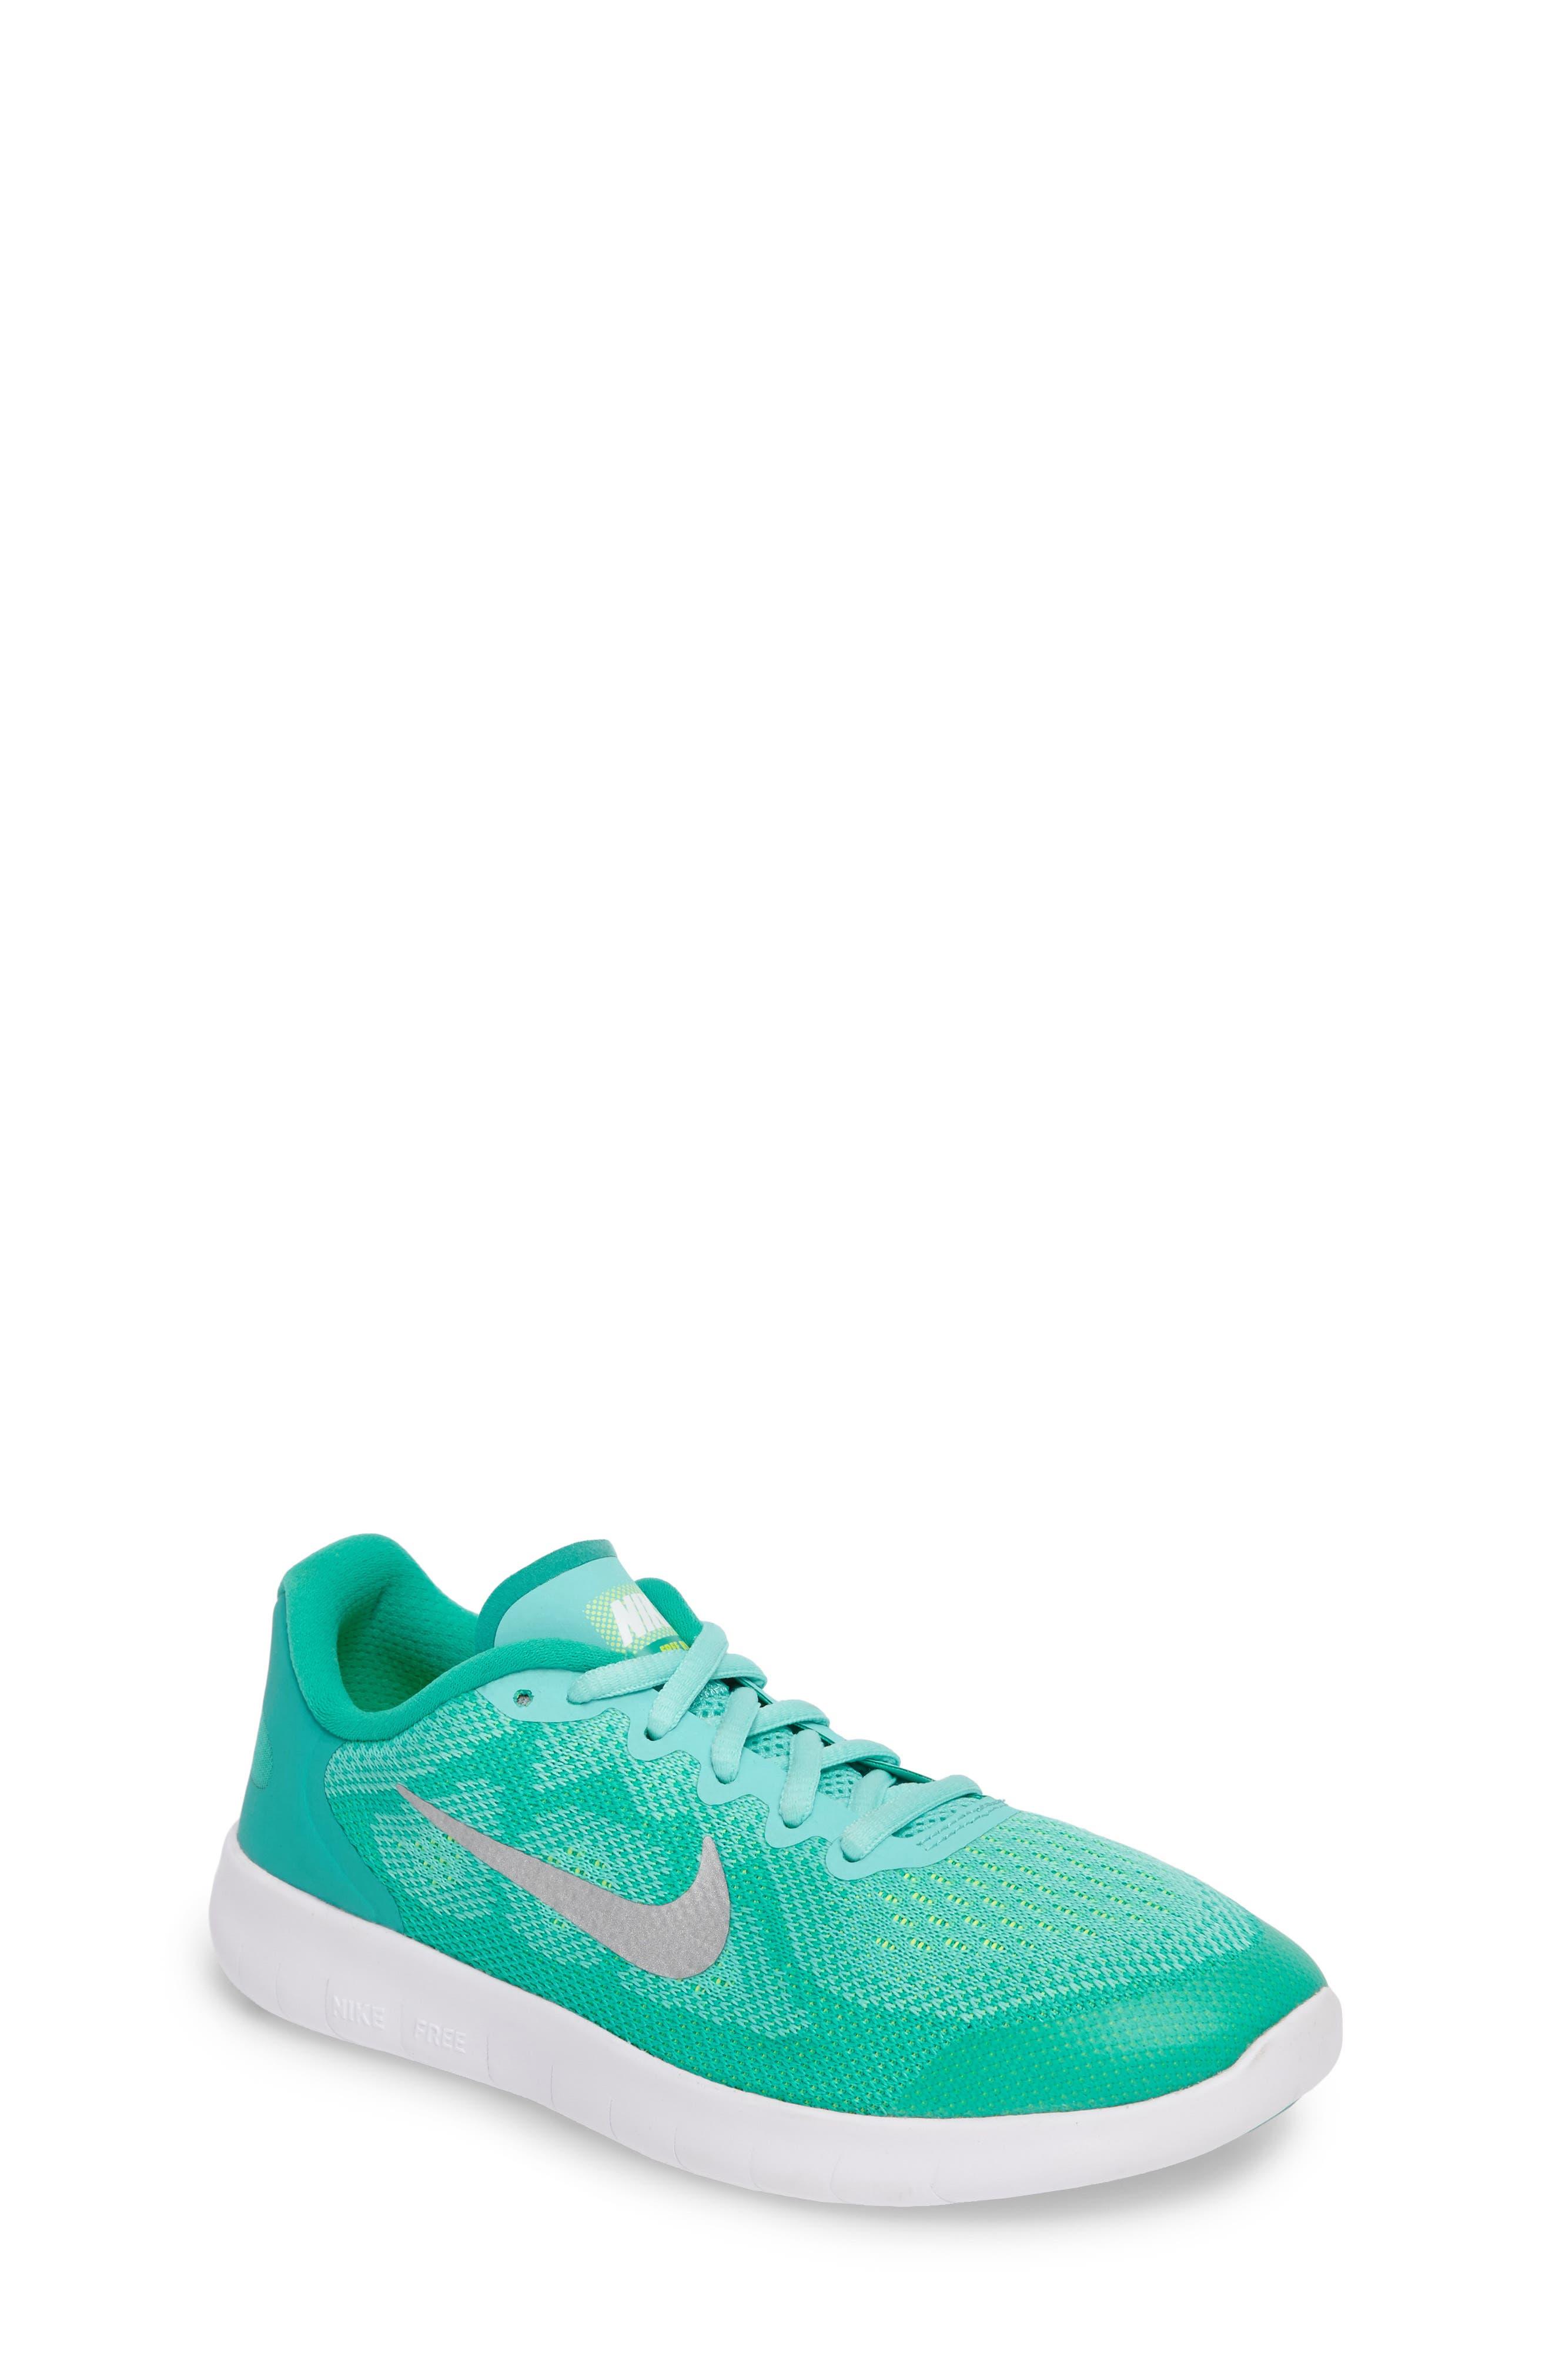 Alternate Image 1 Selected - Nike Free Run 2 Athletic Shoe (Big Kid)